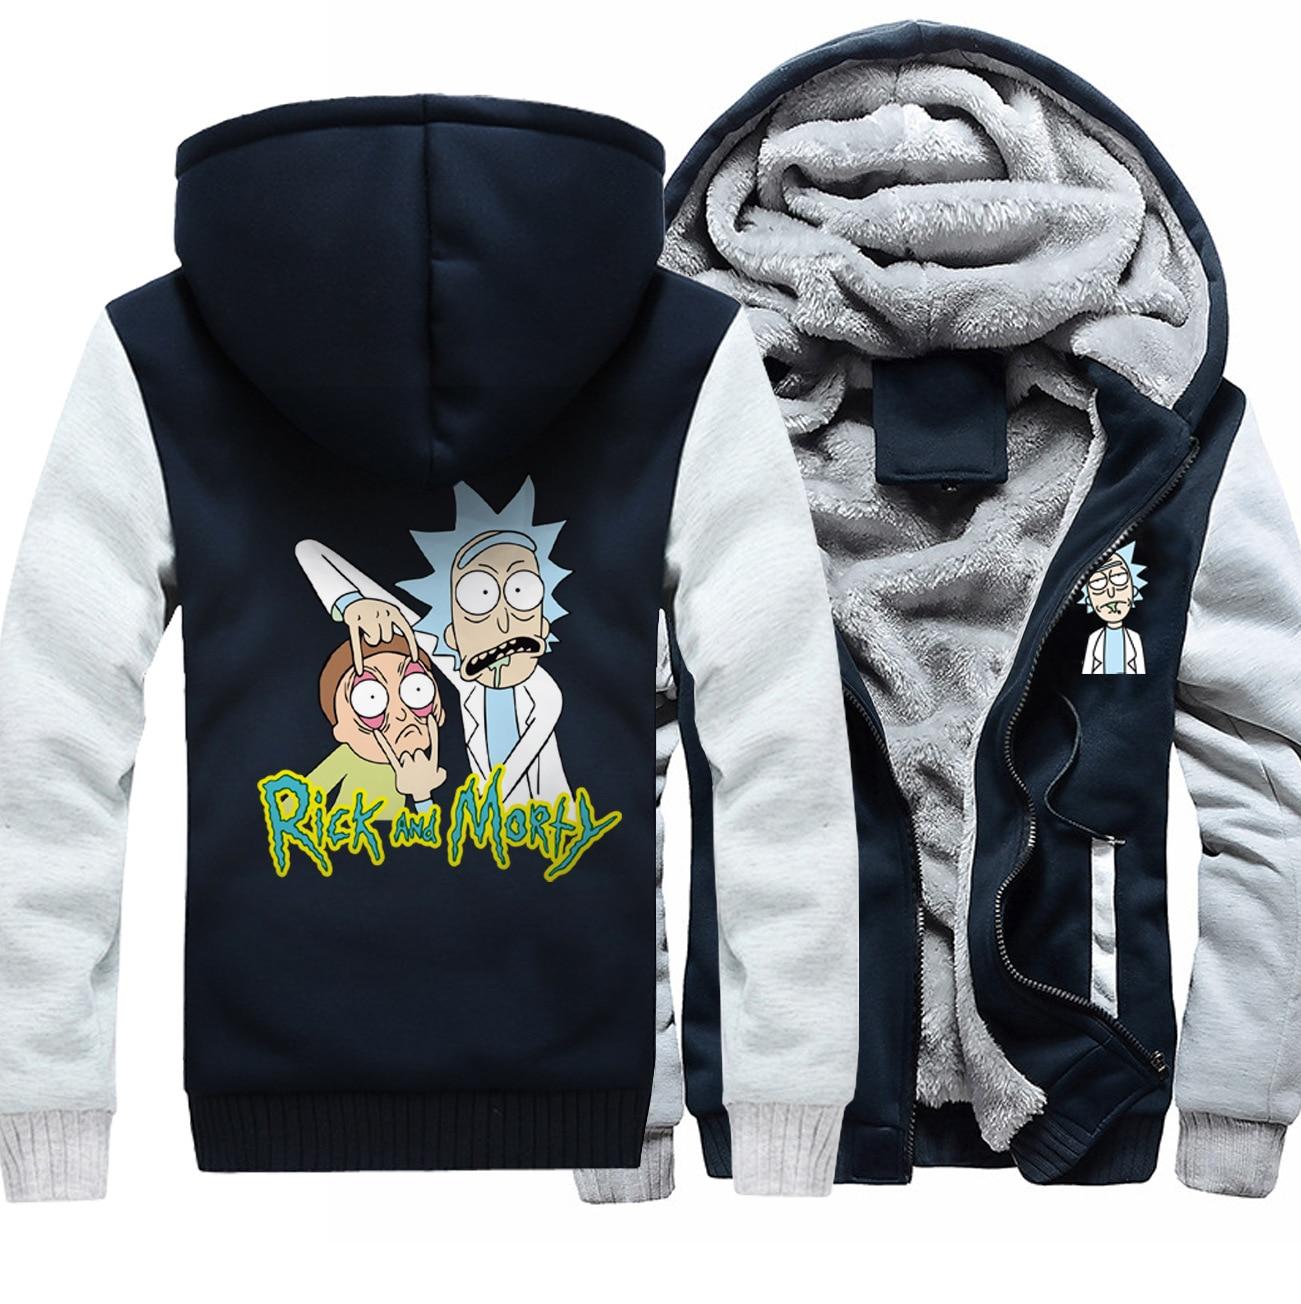 New Rick and Morty Coat Jacket